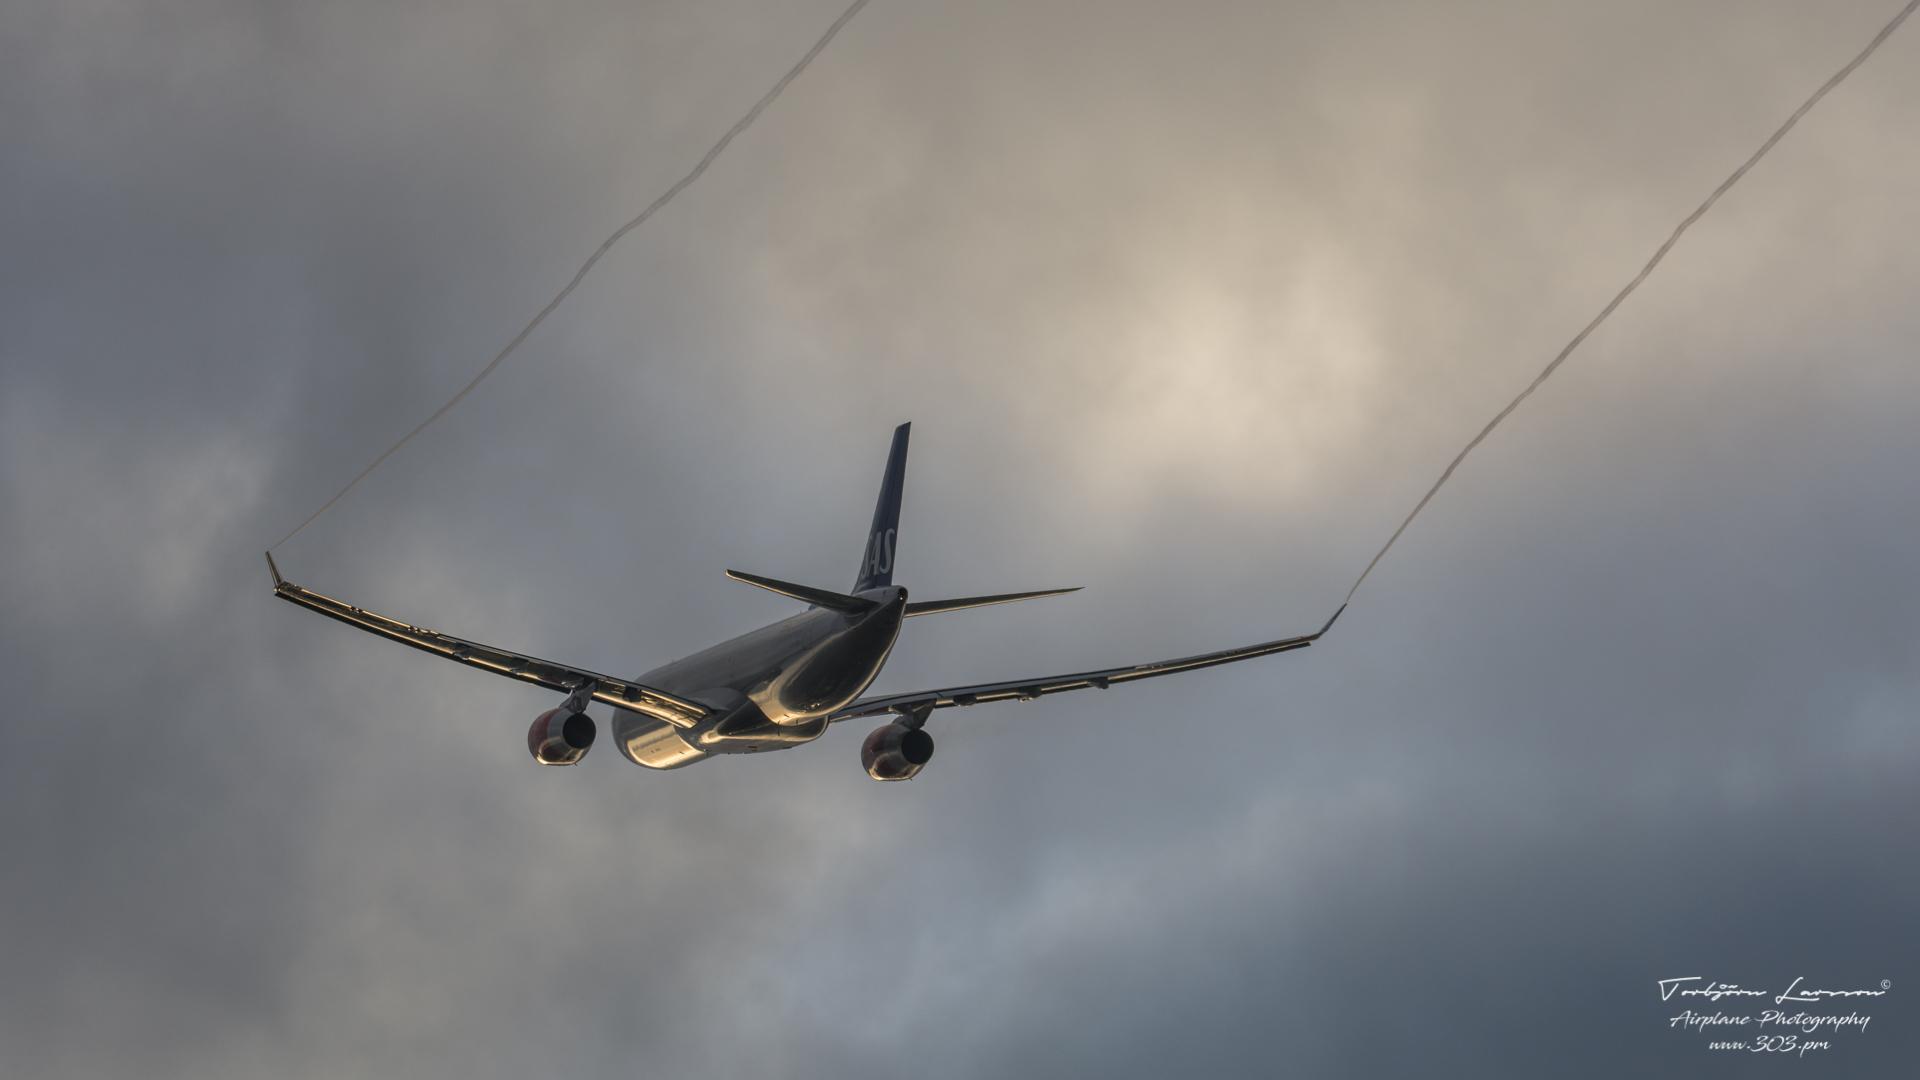 ACE_6863-Airbus A330-343E - SAS LN-RKU